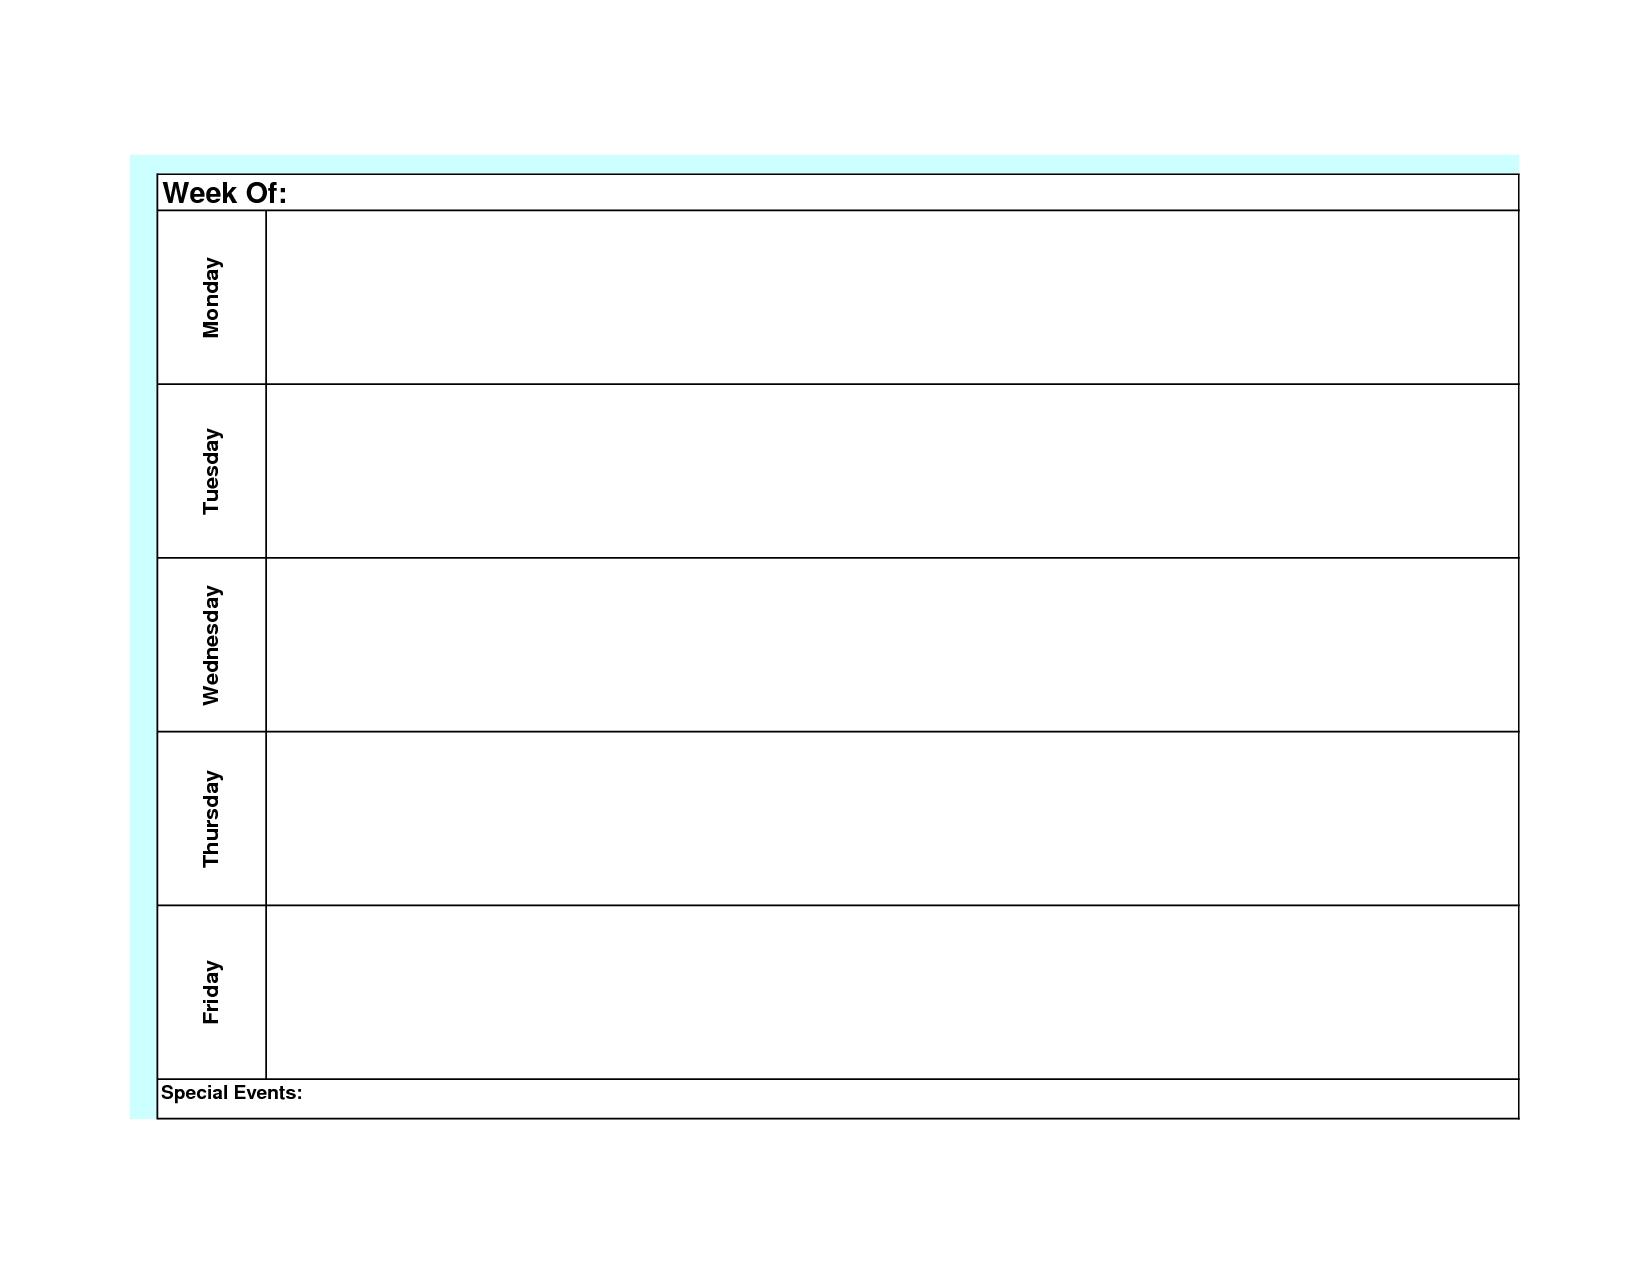 Blank Weekly Calendar Template Monday Friday   Weekly Blank Monday Through Friday Schedule Word